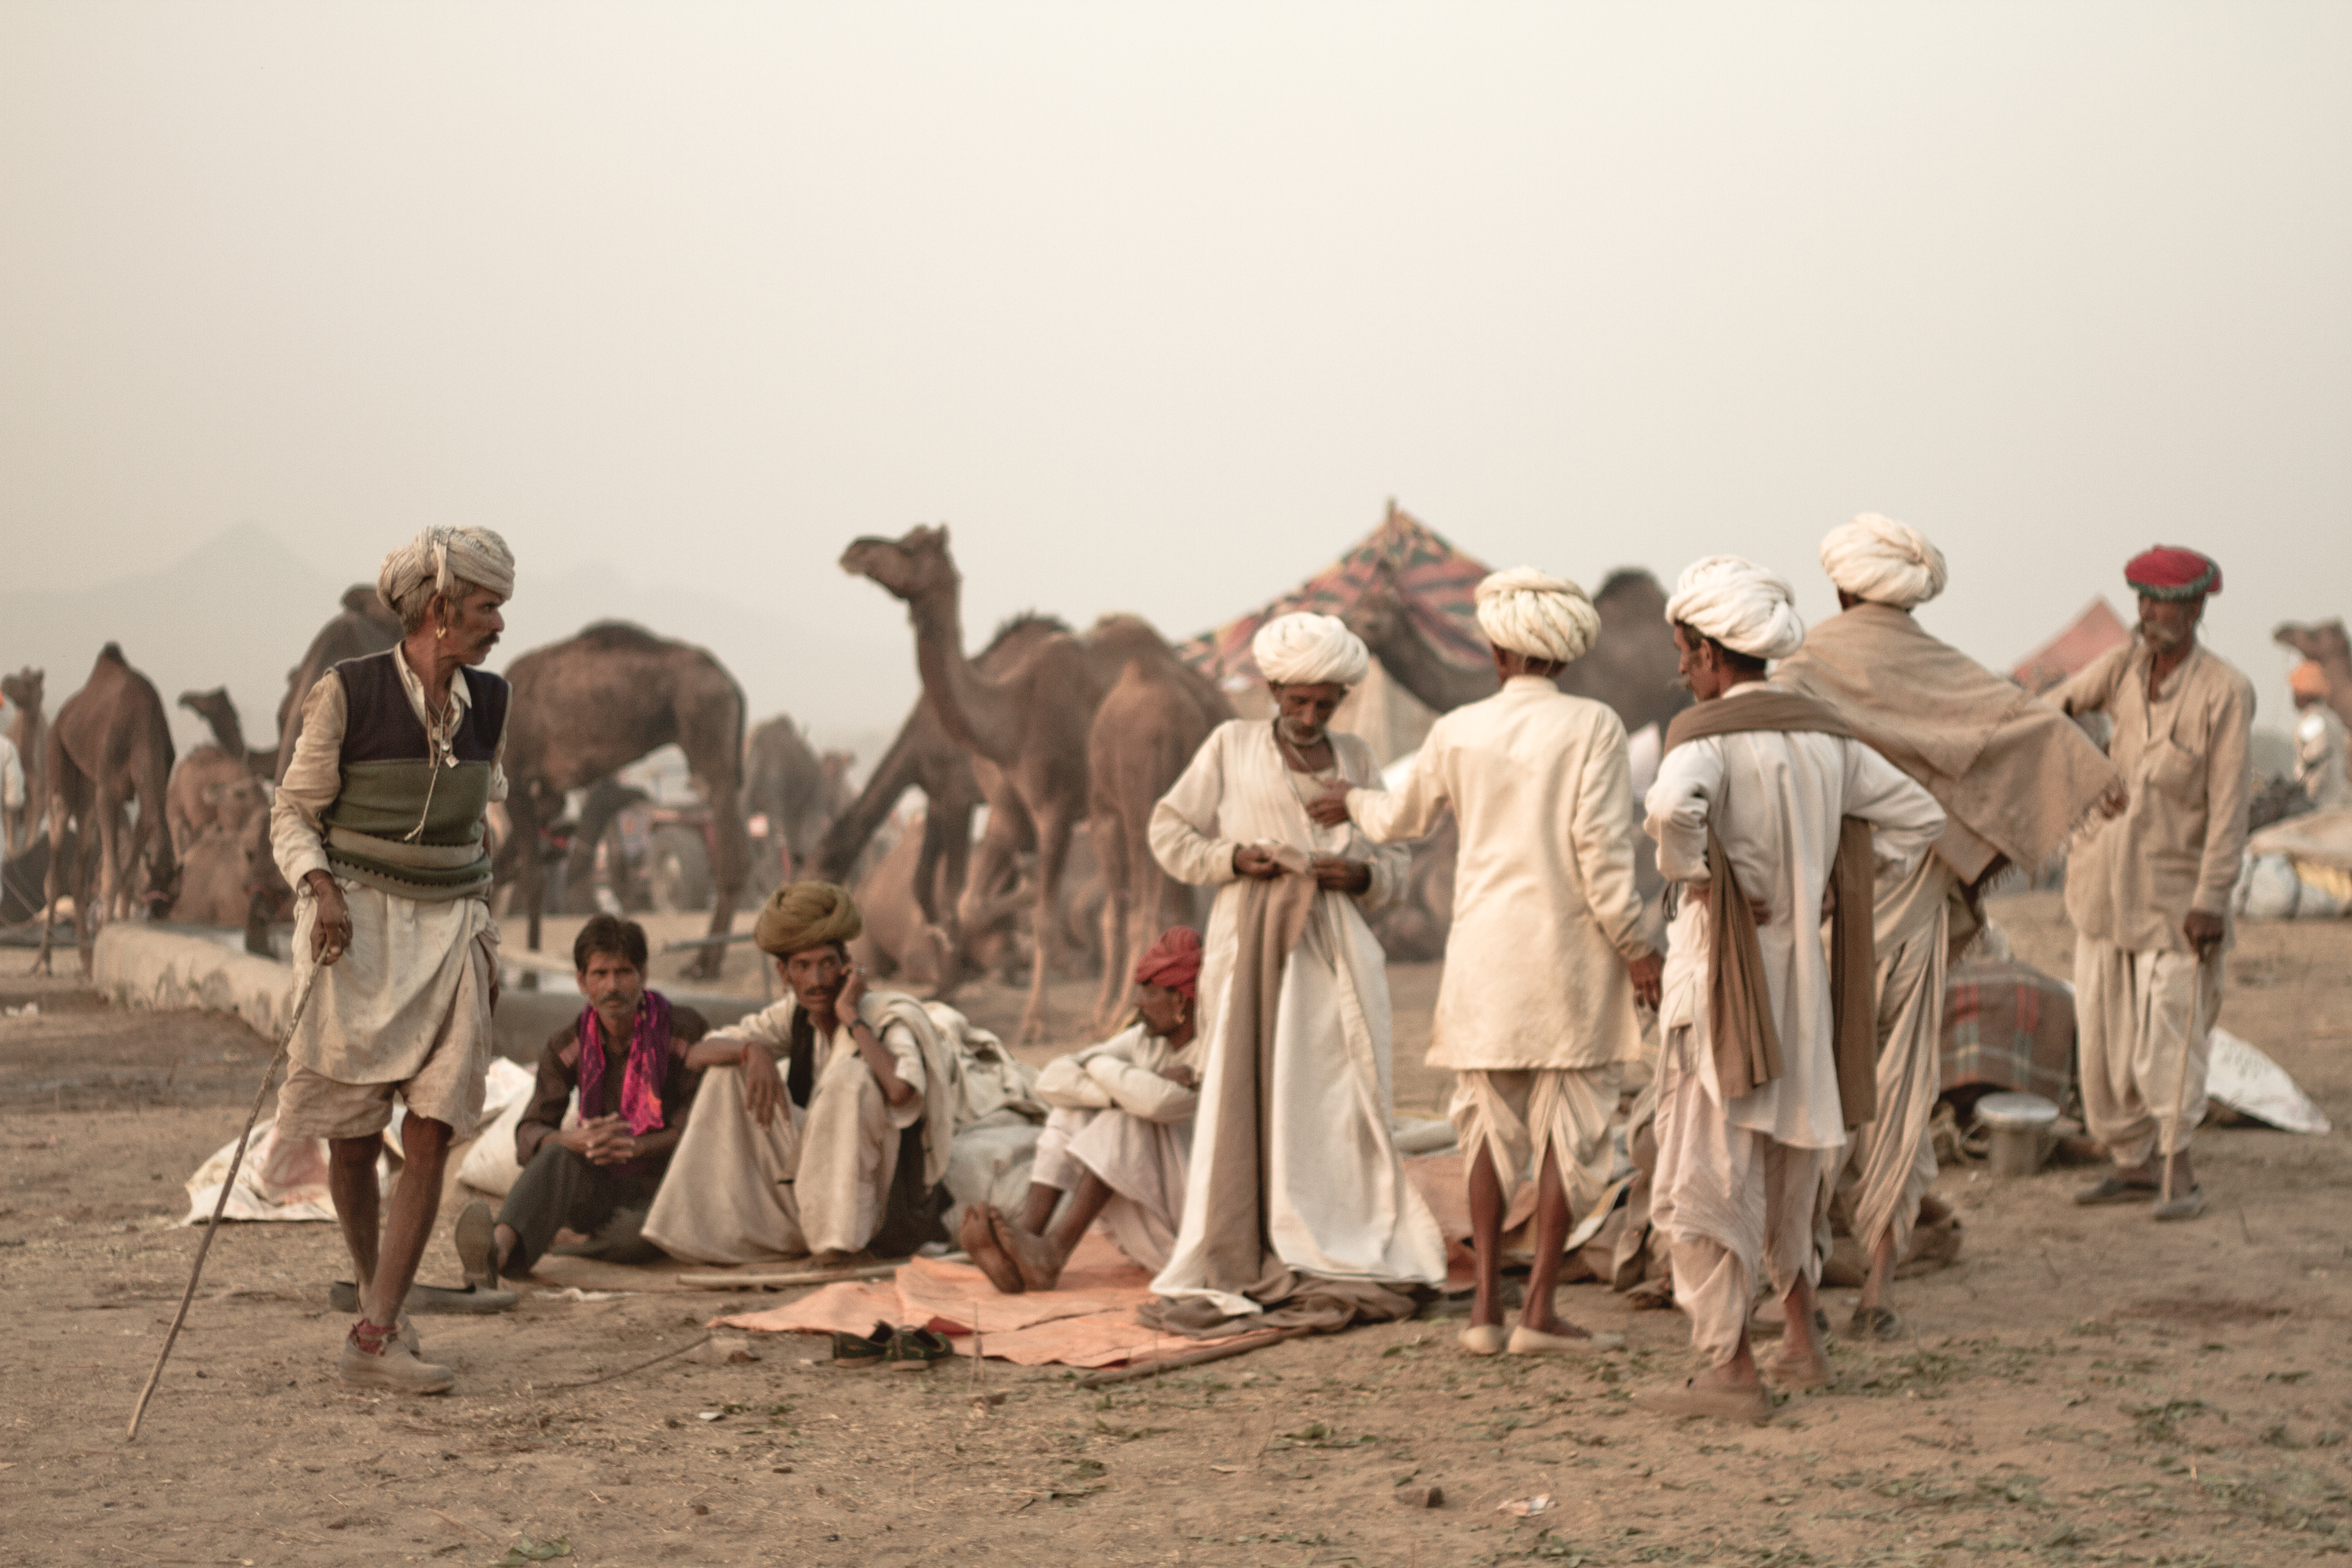 Traders, Camel Fair, India 2013